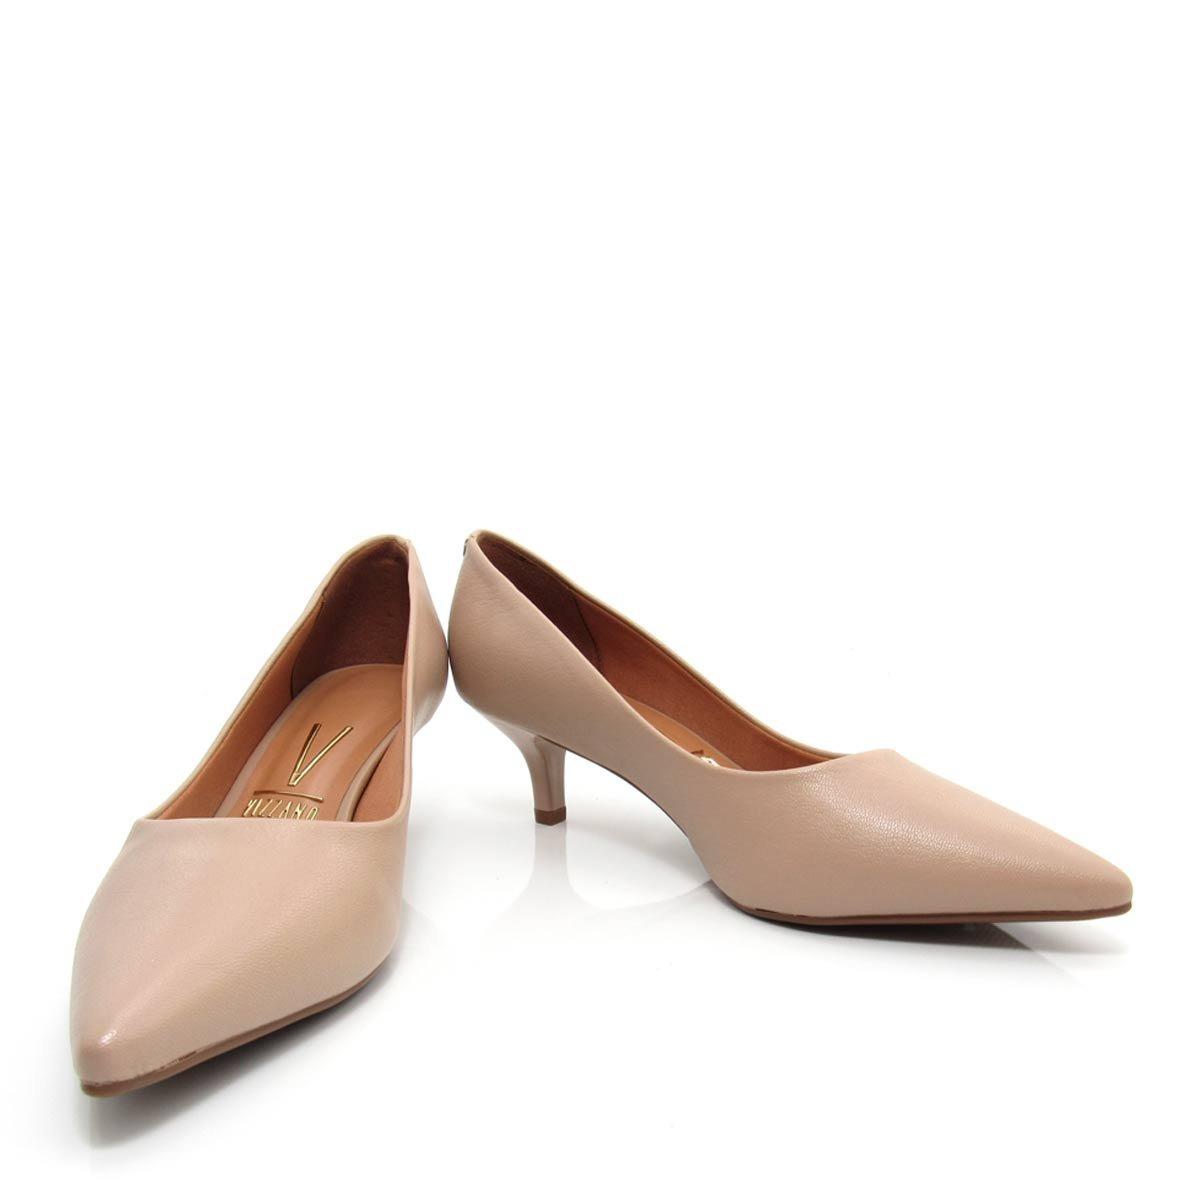 de610676b7 sapato scarpin feminino vizzano 1122600 salto baixo. Carregando zoom.